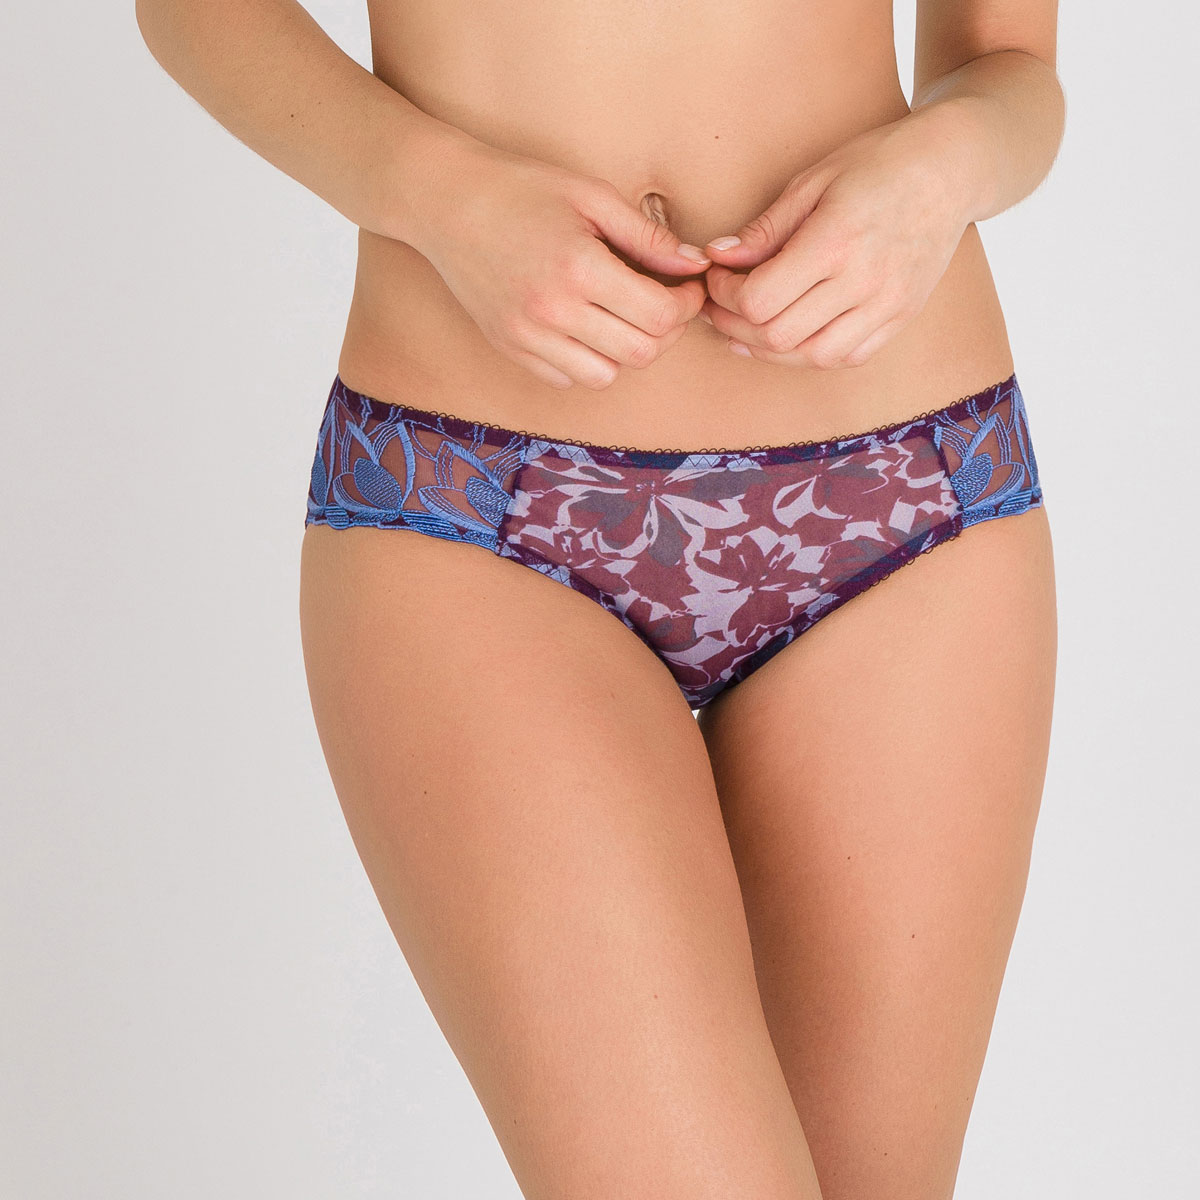 Mini brief in Purple Print - Daily Elegance-PLAYTEX